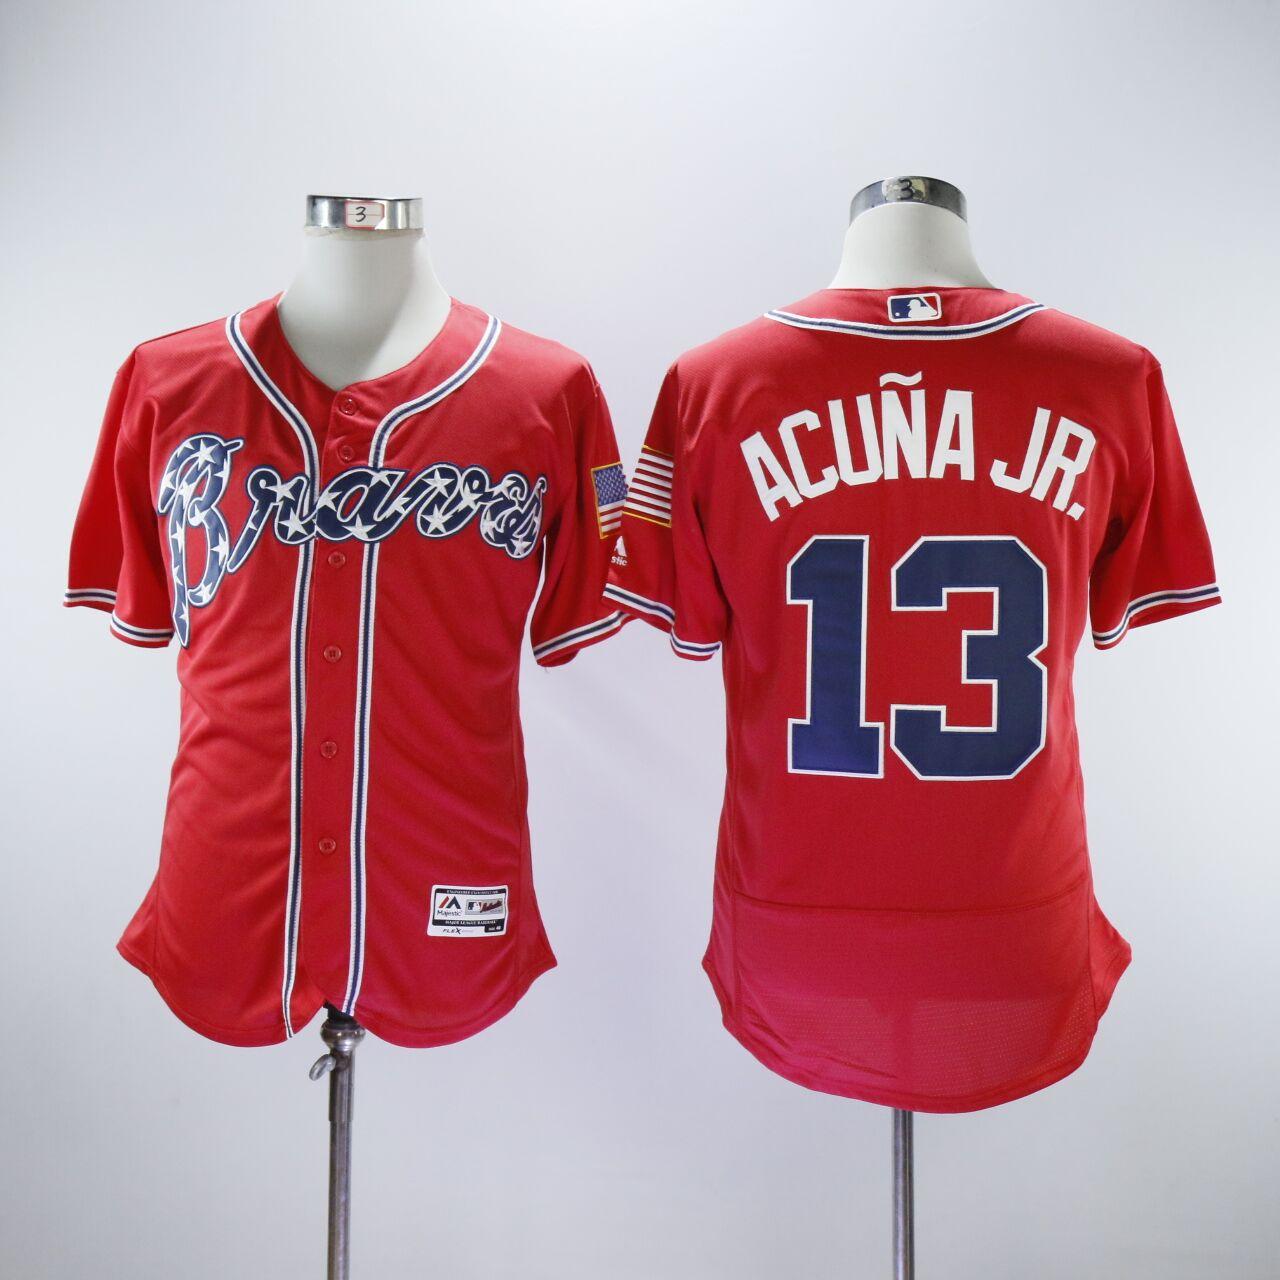 Braves 13 Ronald Acuna Jr. Red Flexbase Jersey